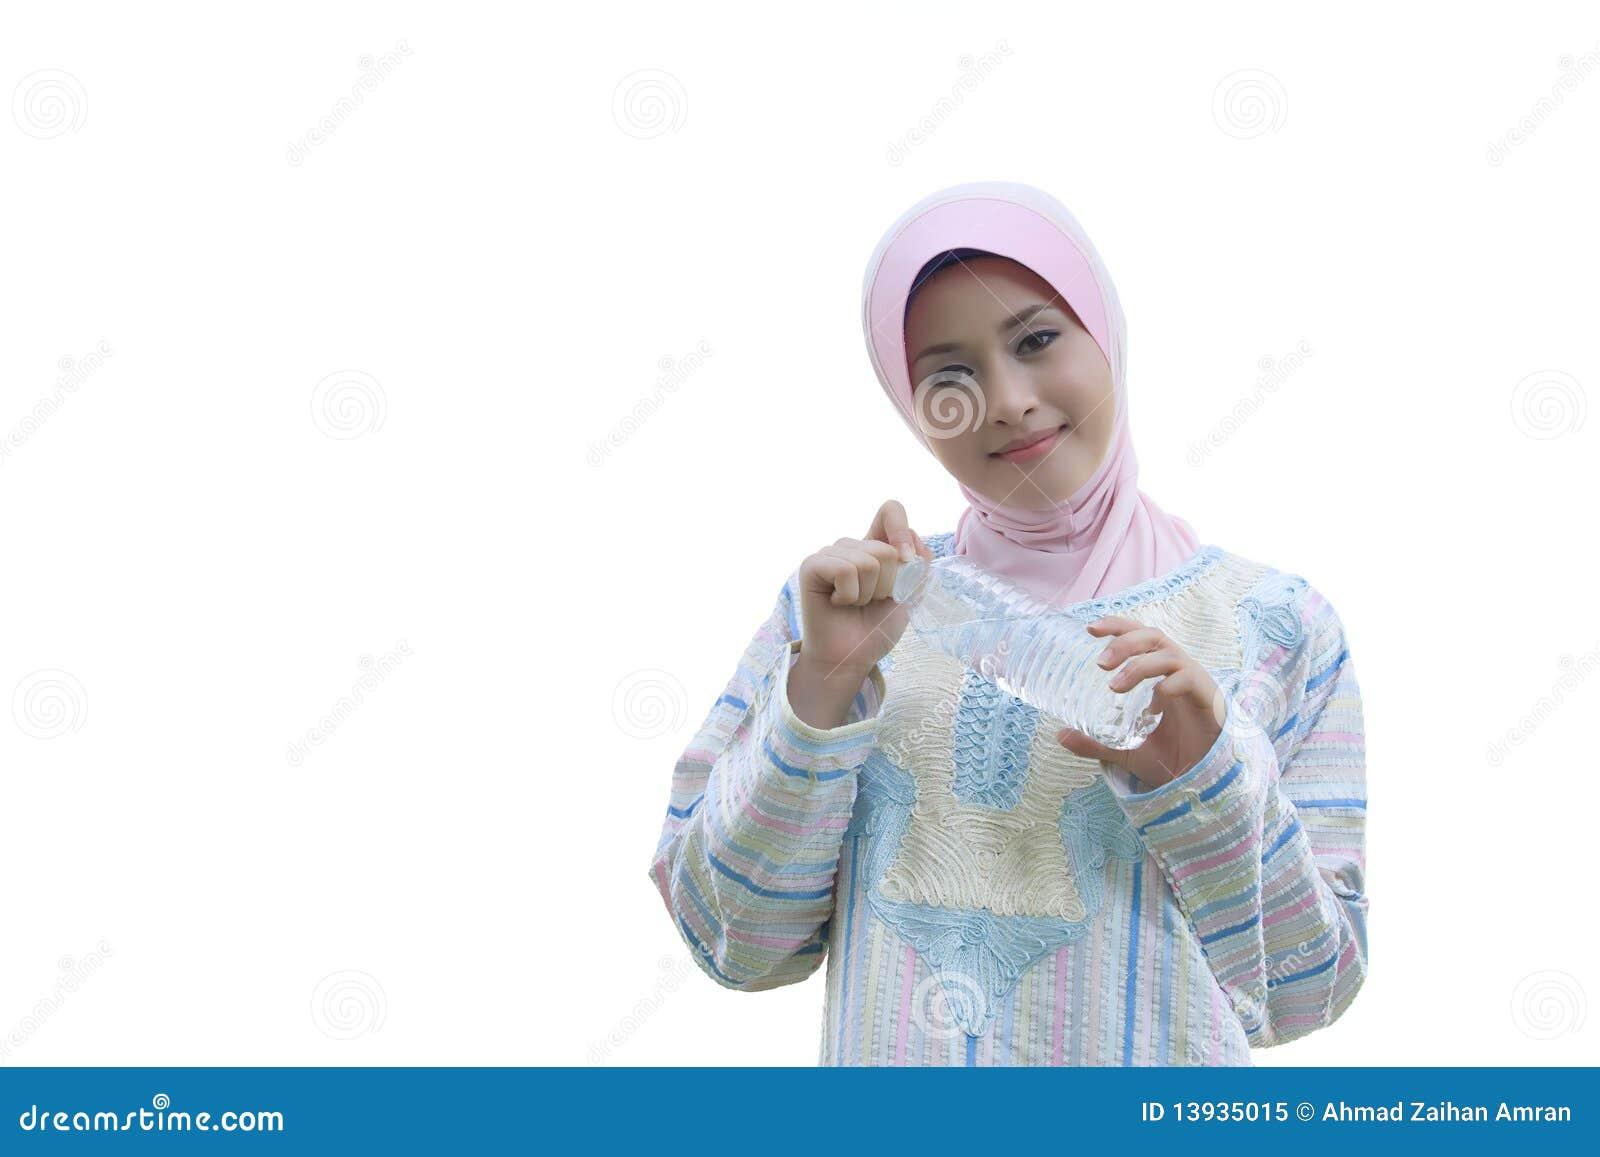 mineral bluff single muslim girls I'm a good girl in mineral bluff seeking a wife  interracial dating in culberson culberson latin dating muslim dating culberson lds dating culberson arab dating .